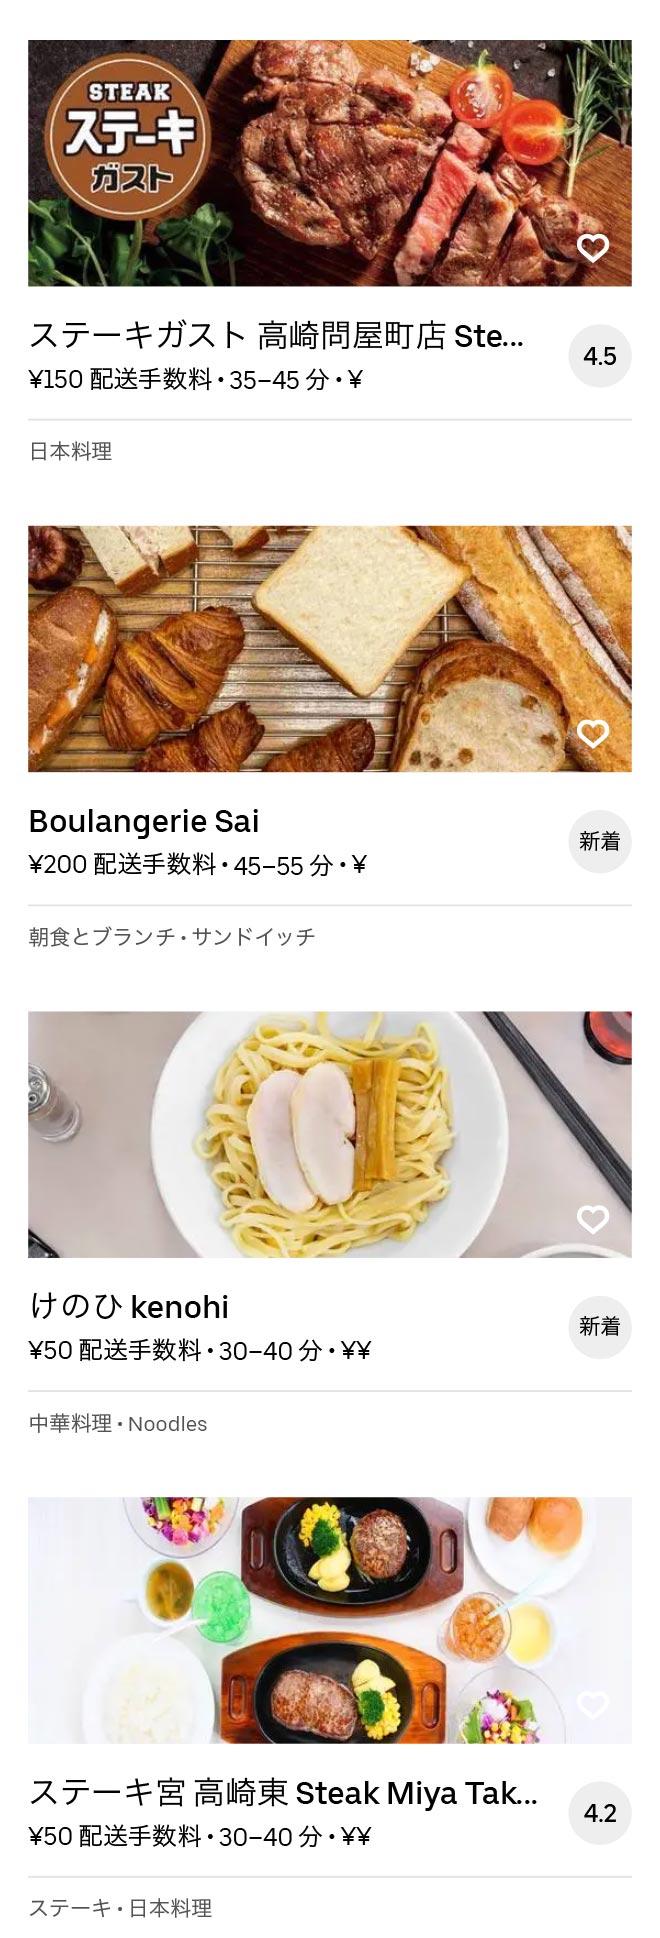 Takasaki menu 2010 10